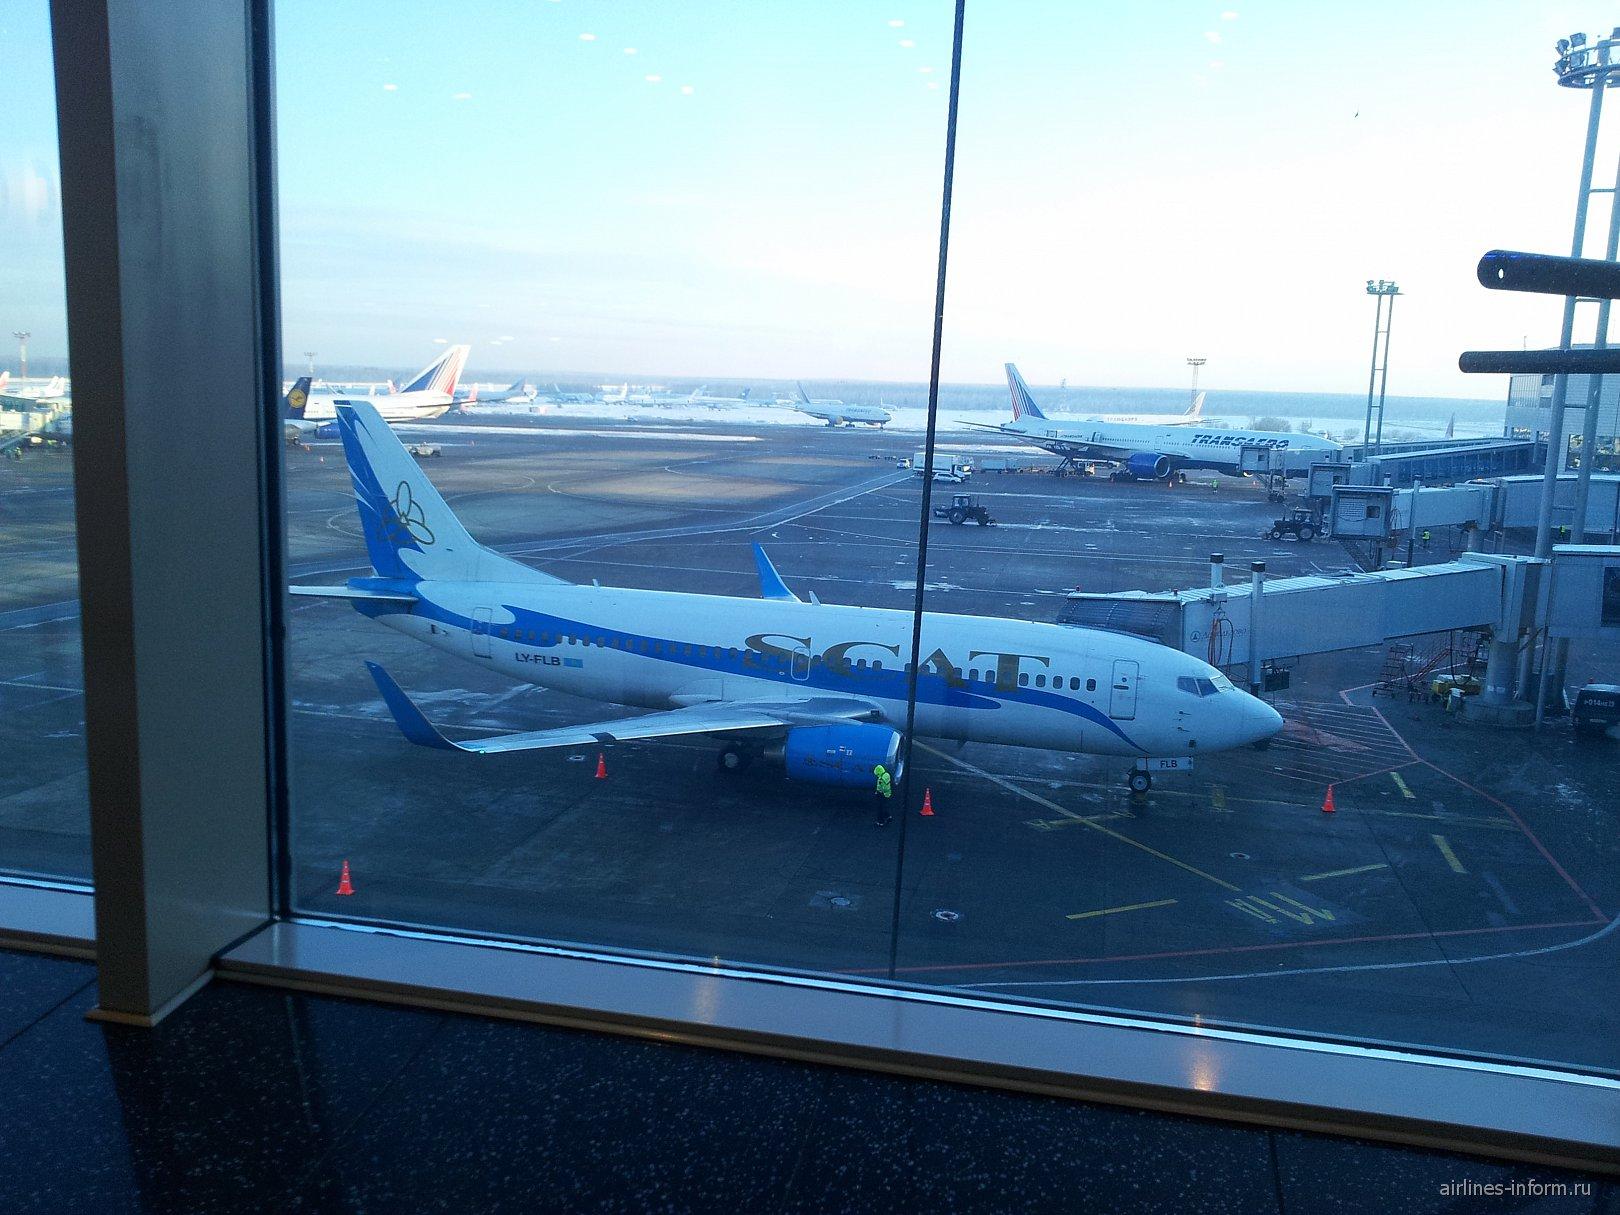 Боинг-737-500 авиакомпании СКАТ в аэропорту Домодедово